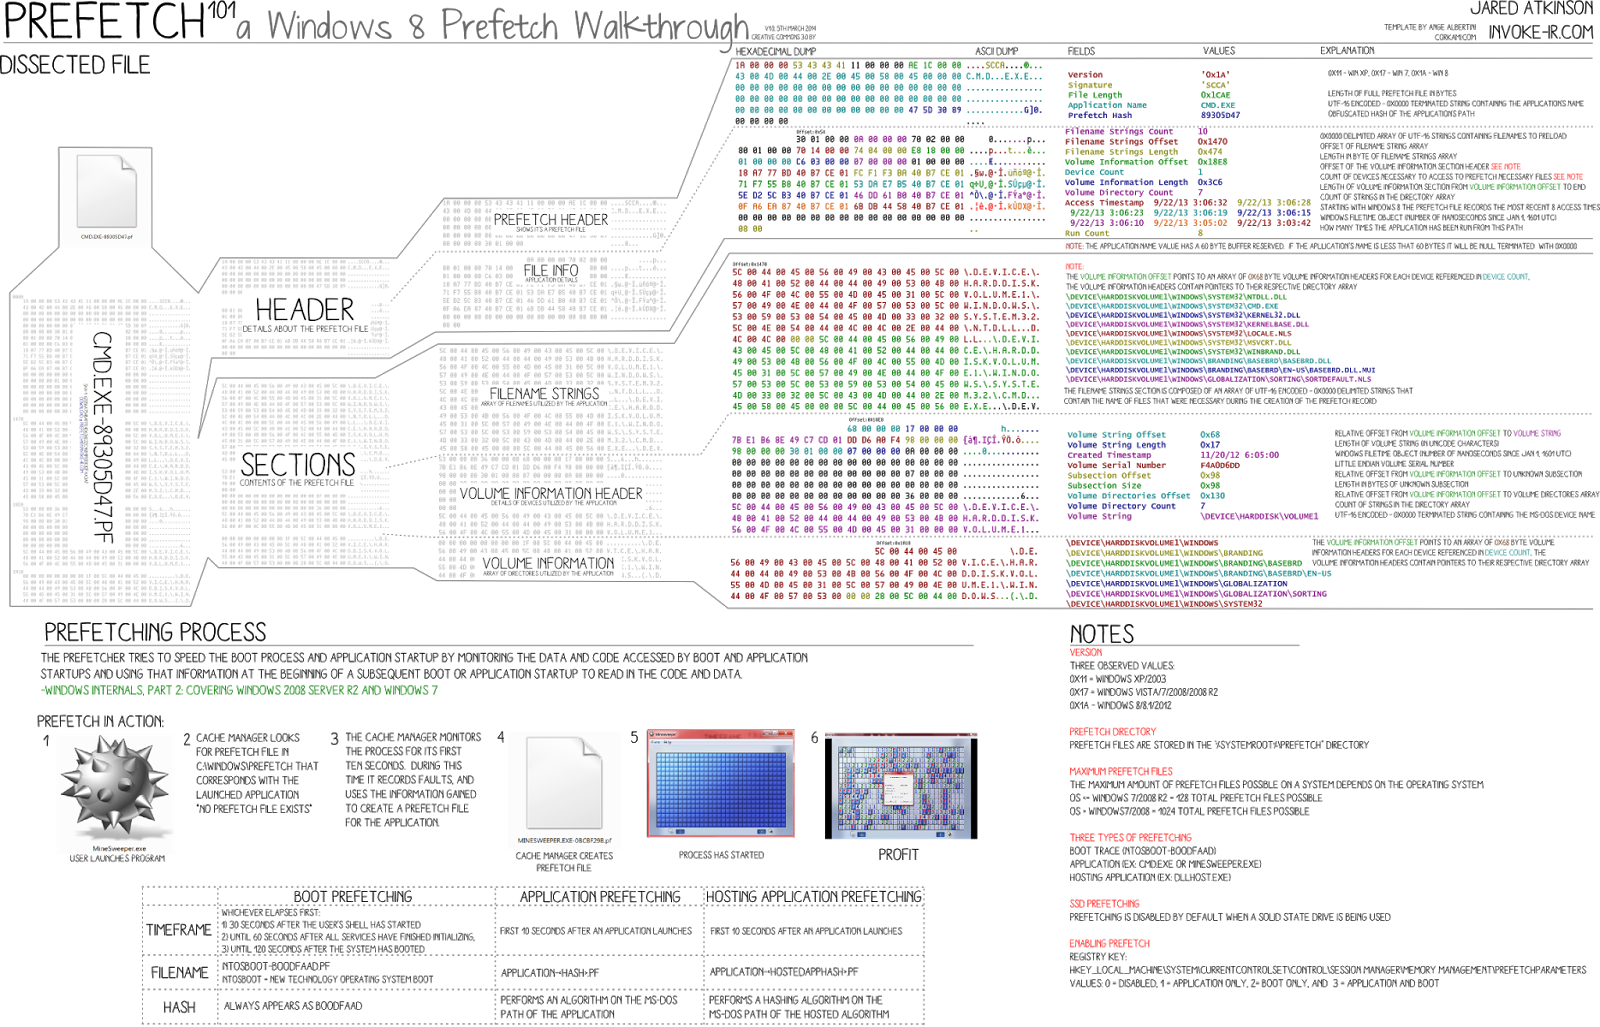 SANS Digital Forensics and Incident Response Blog   Device Profiling